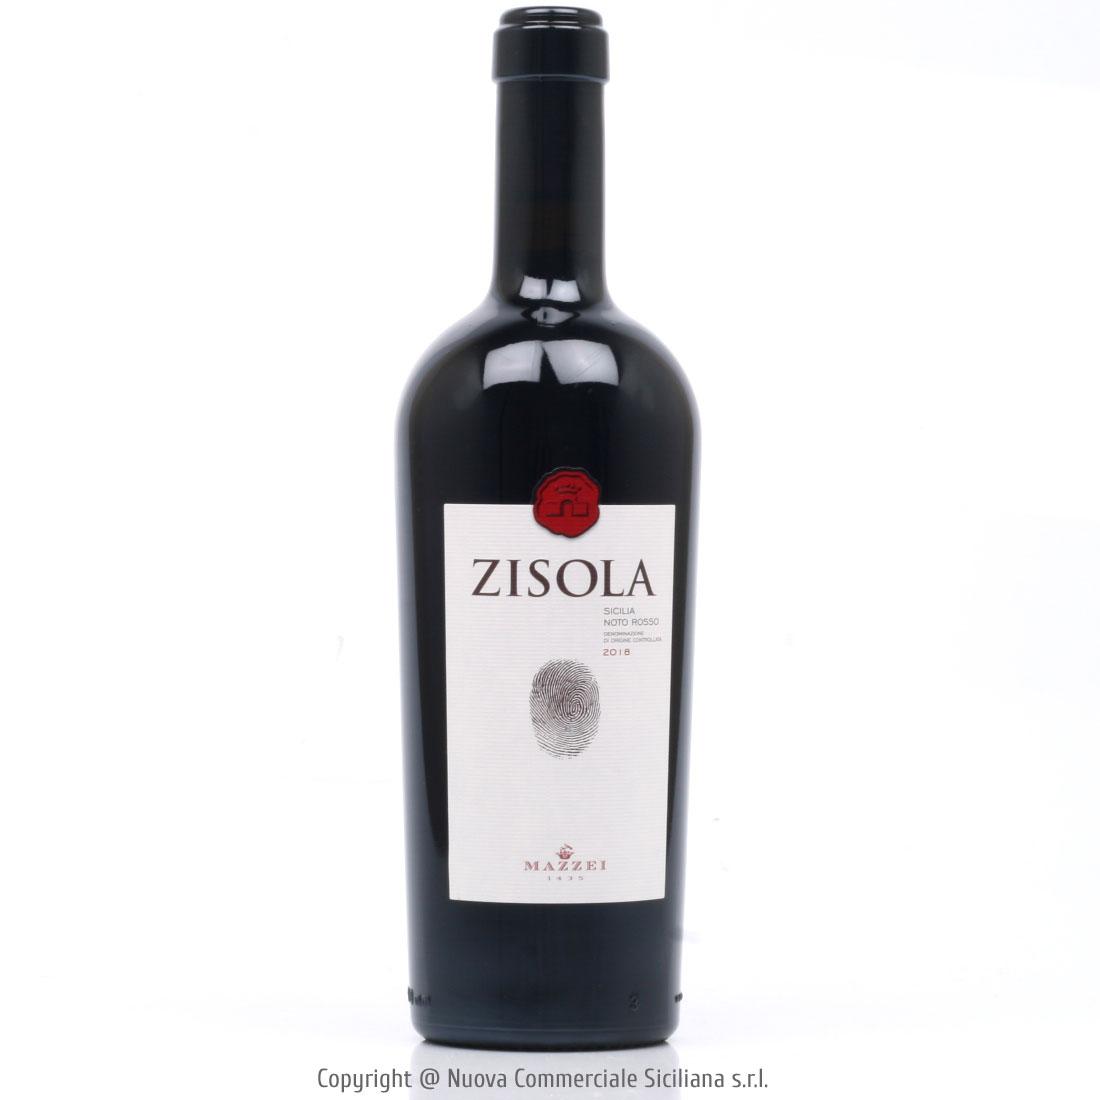 ZISOLA NOTO ROSSO DOC 2018 - SICILY/RED CL 75